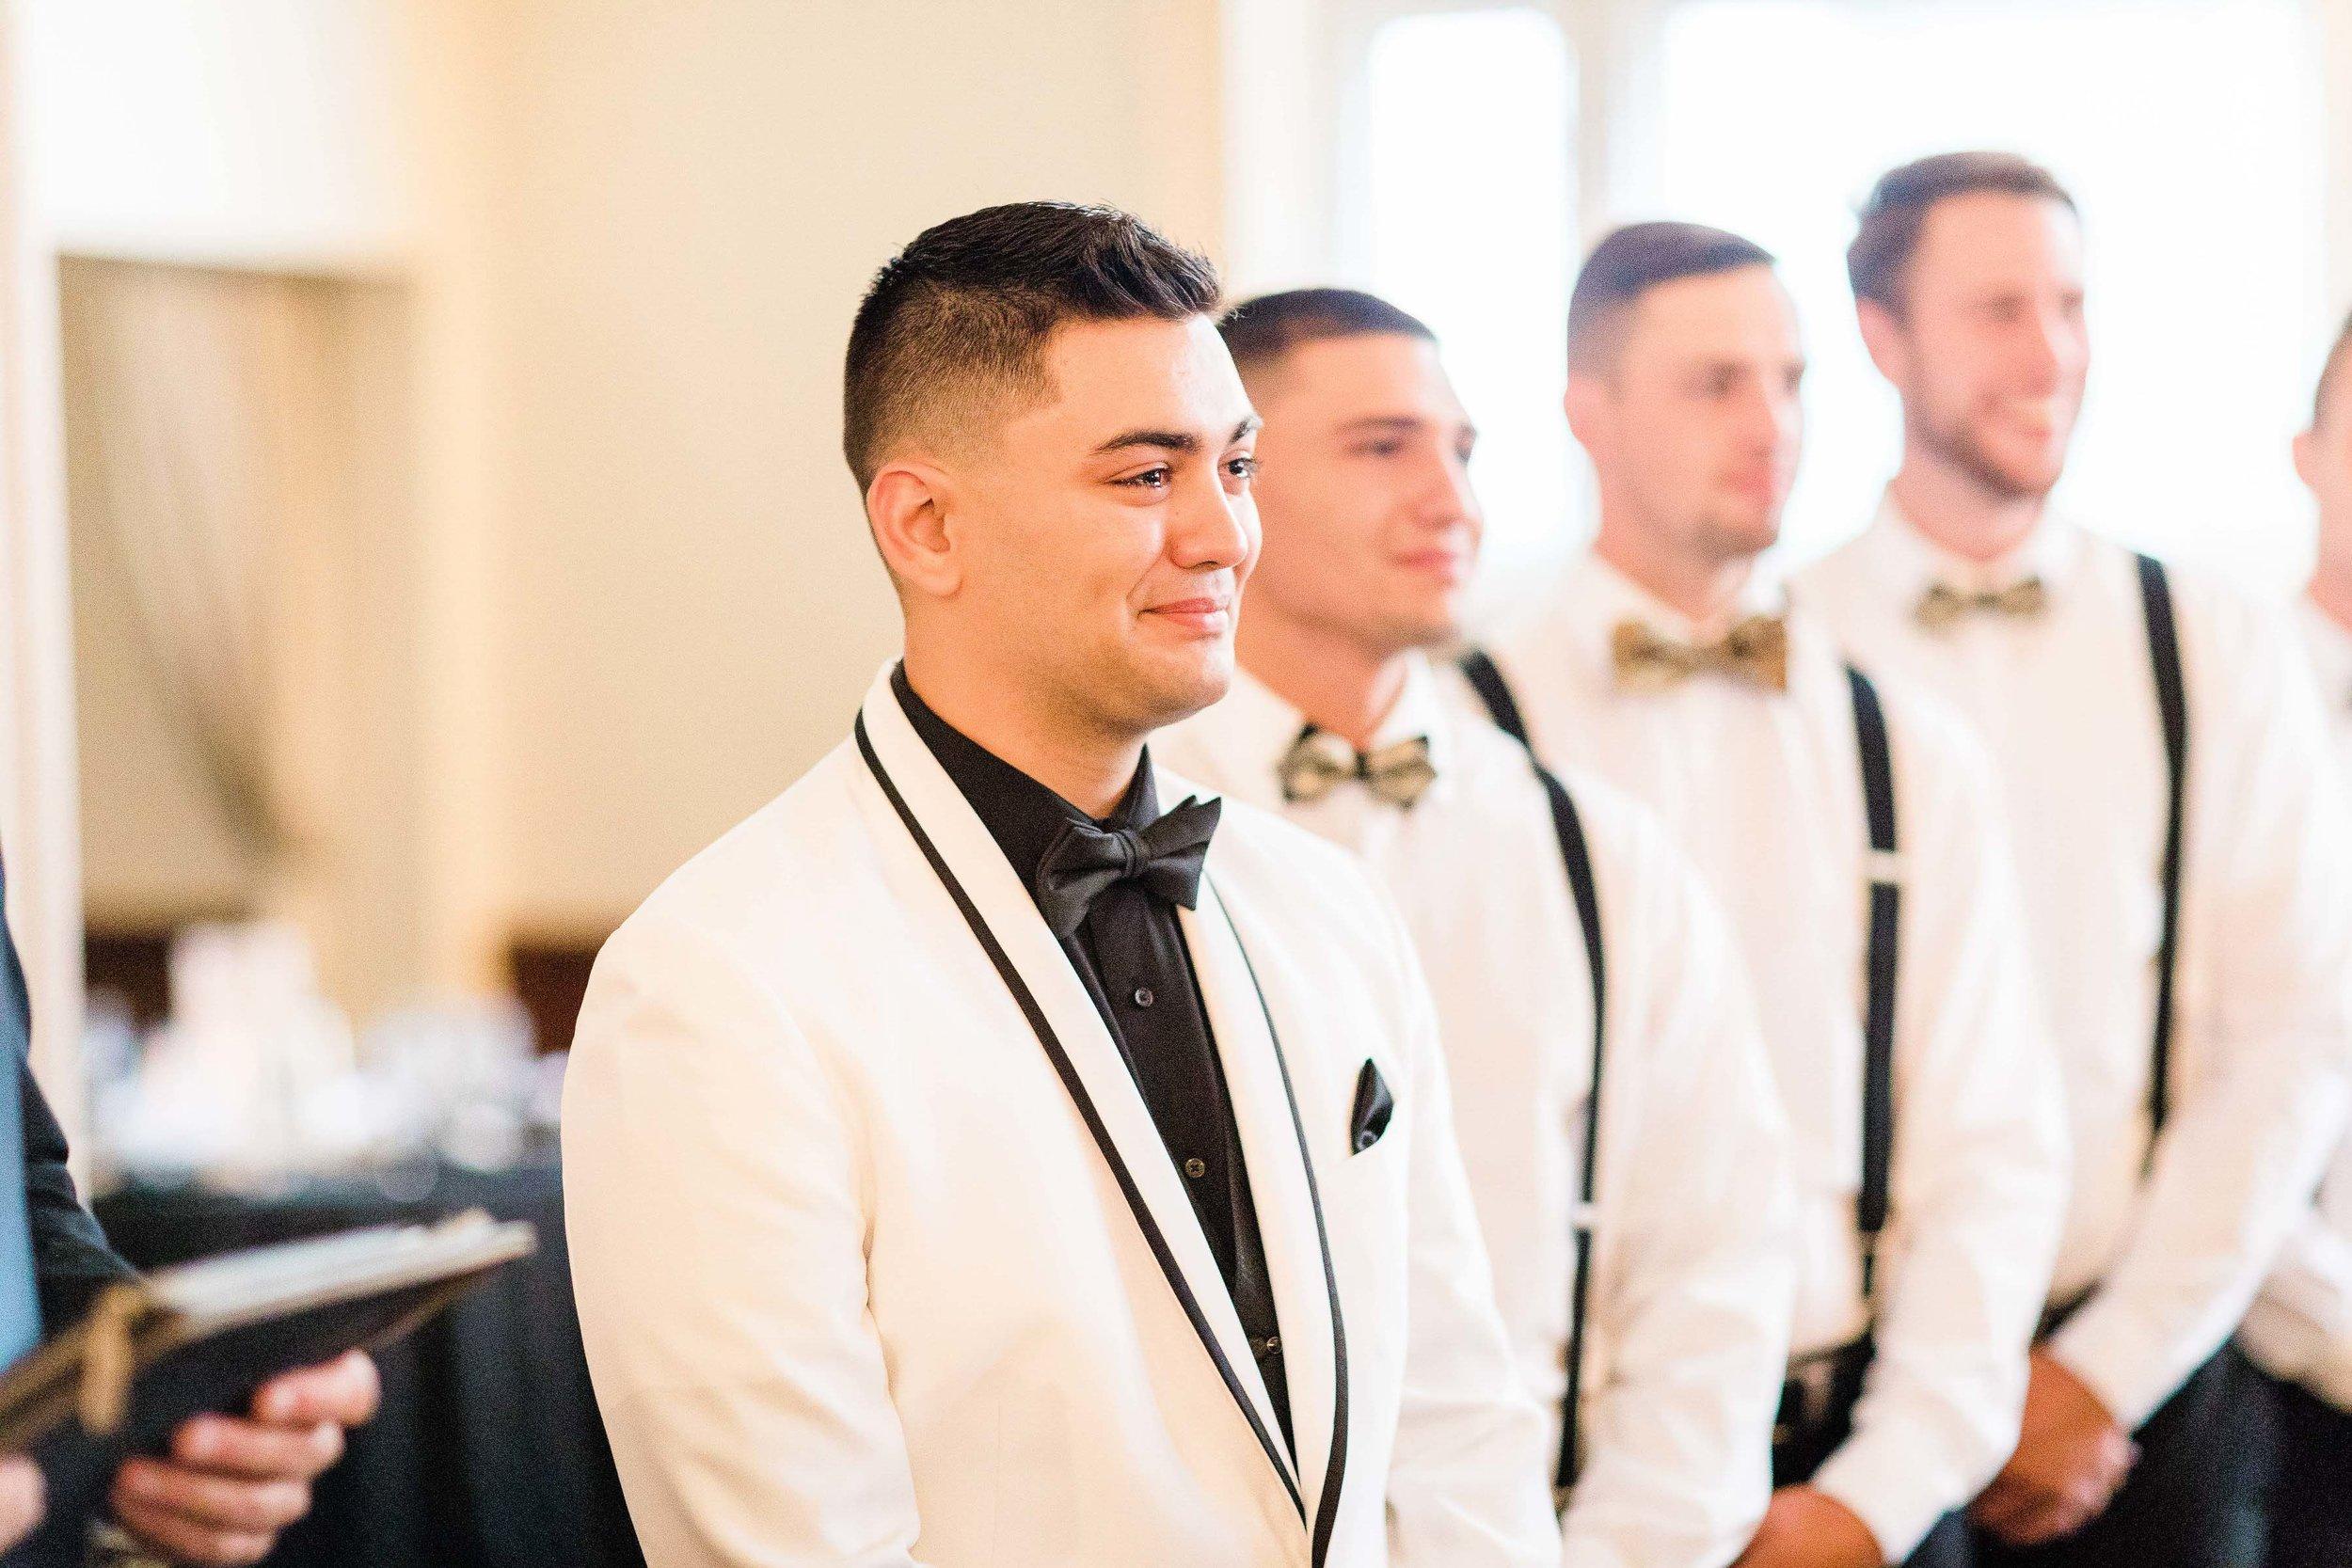 middletown ohio wedding photographer windamere-3.jpg